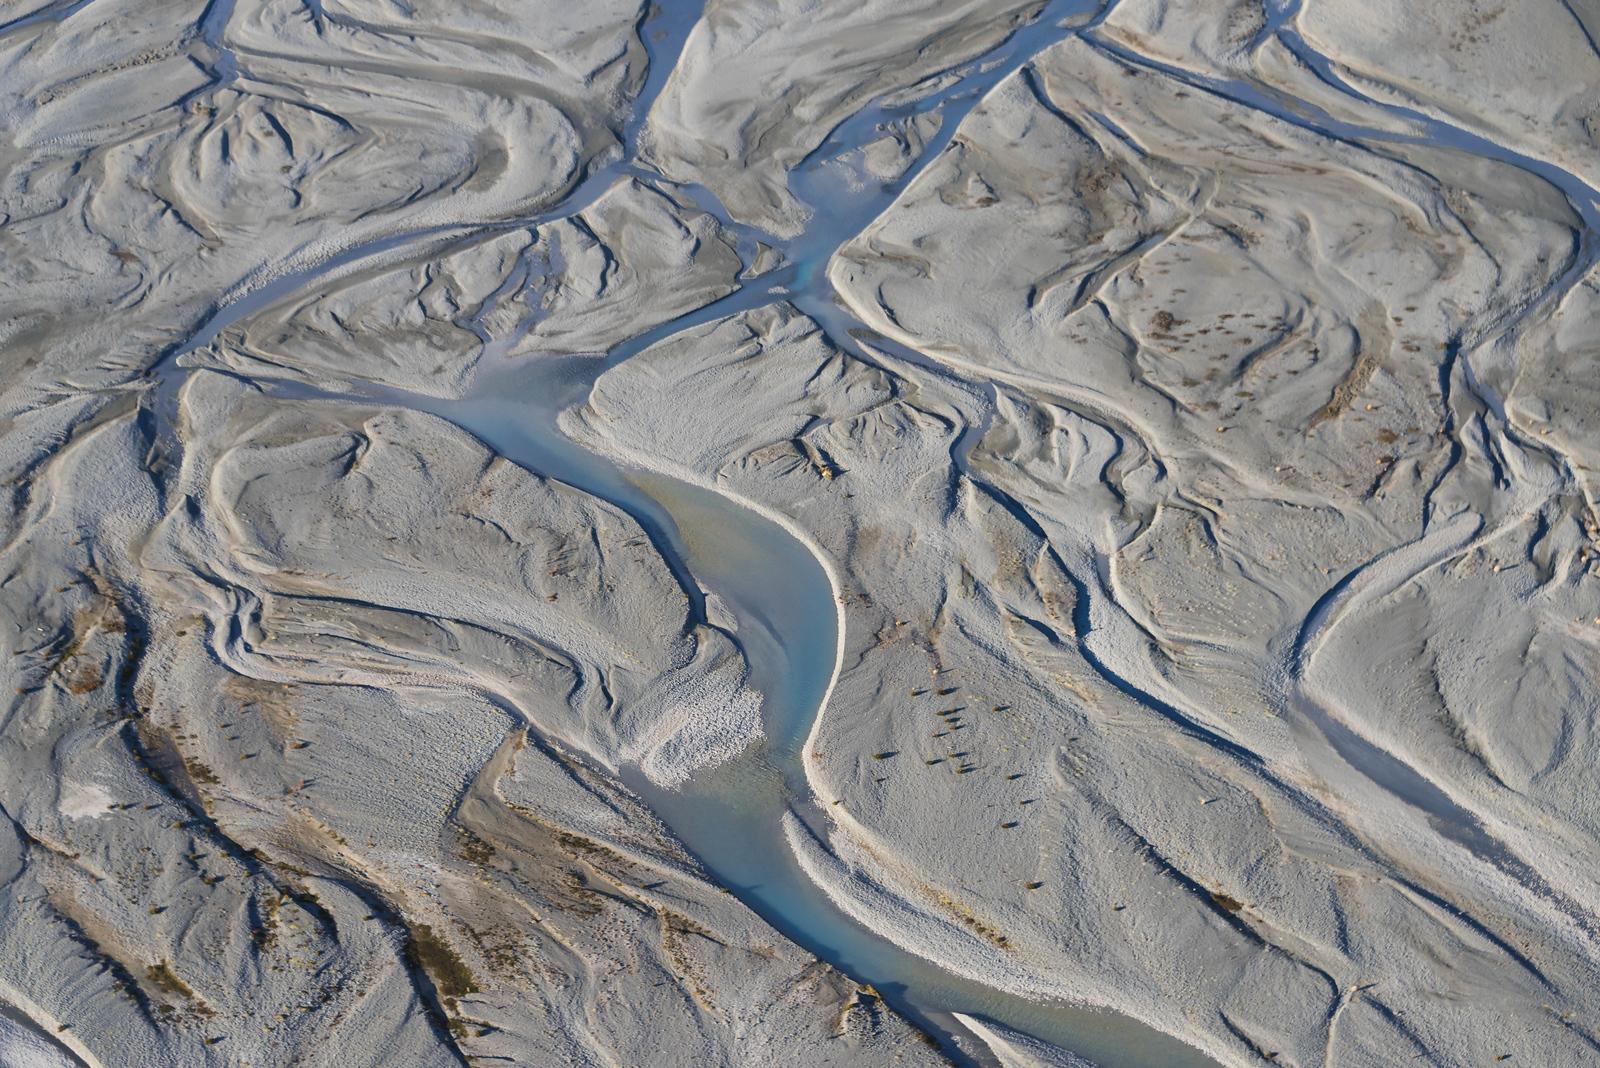 South Island Braided Rivers